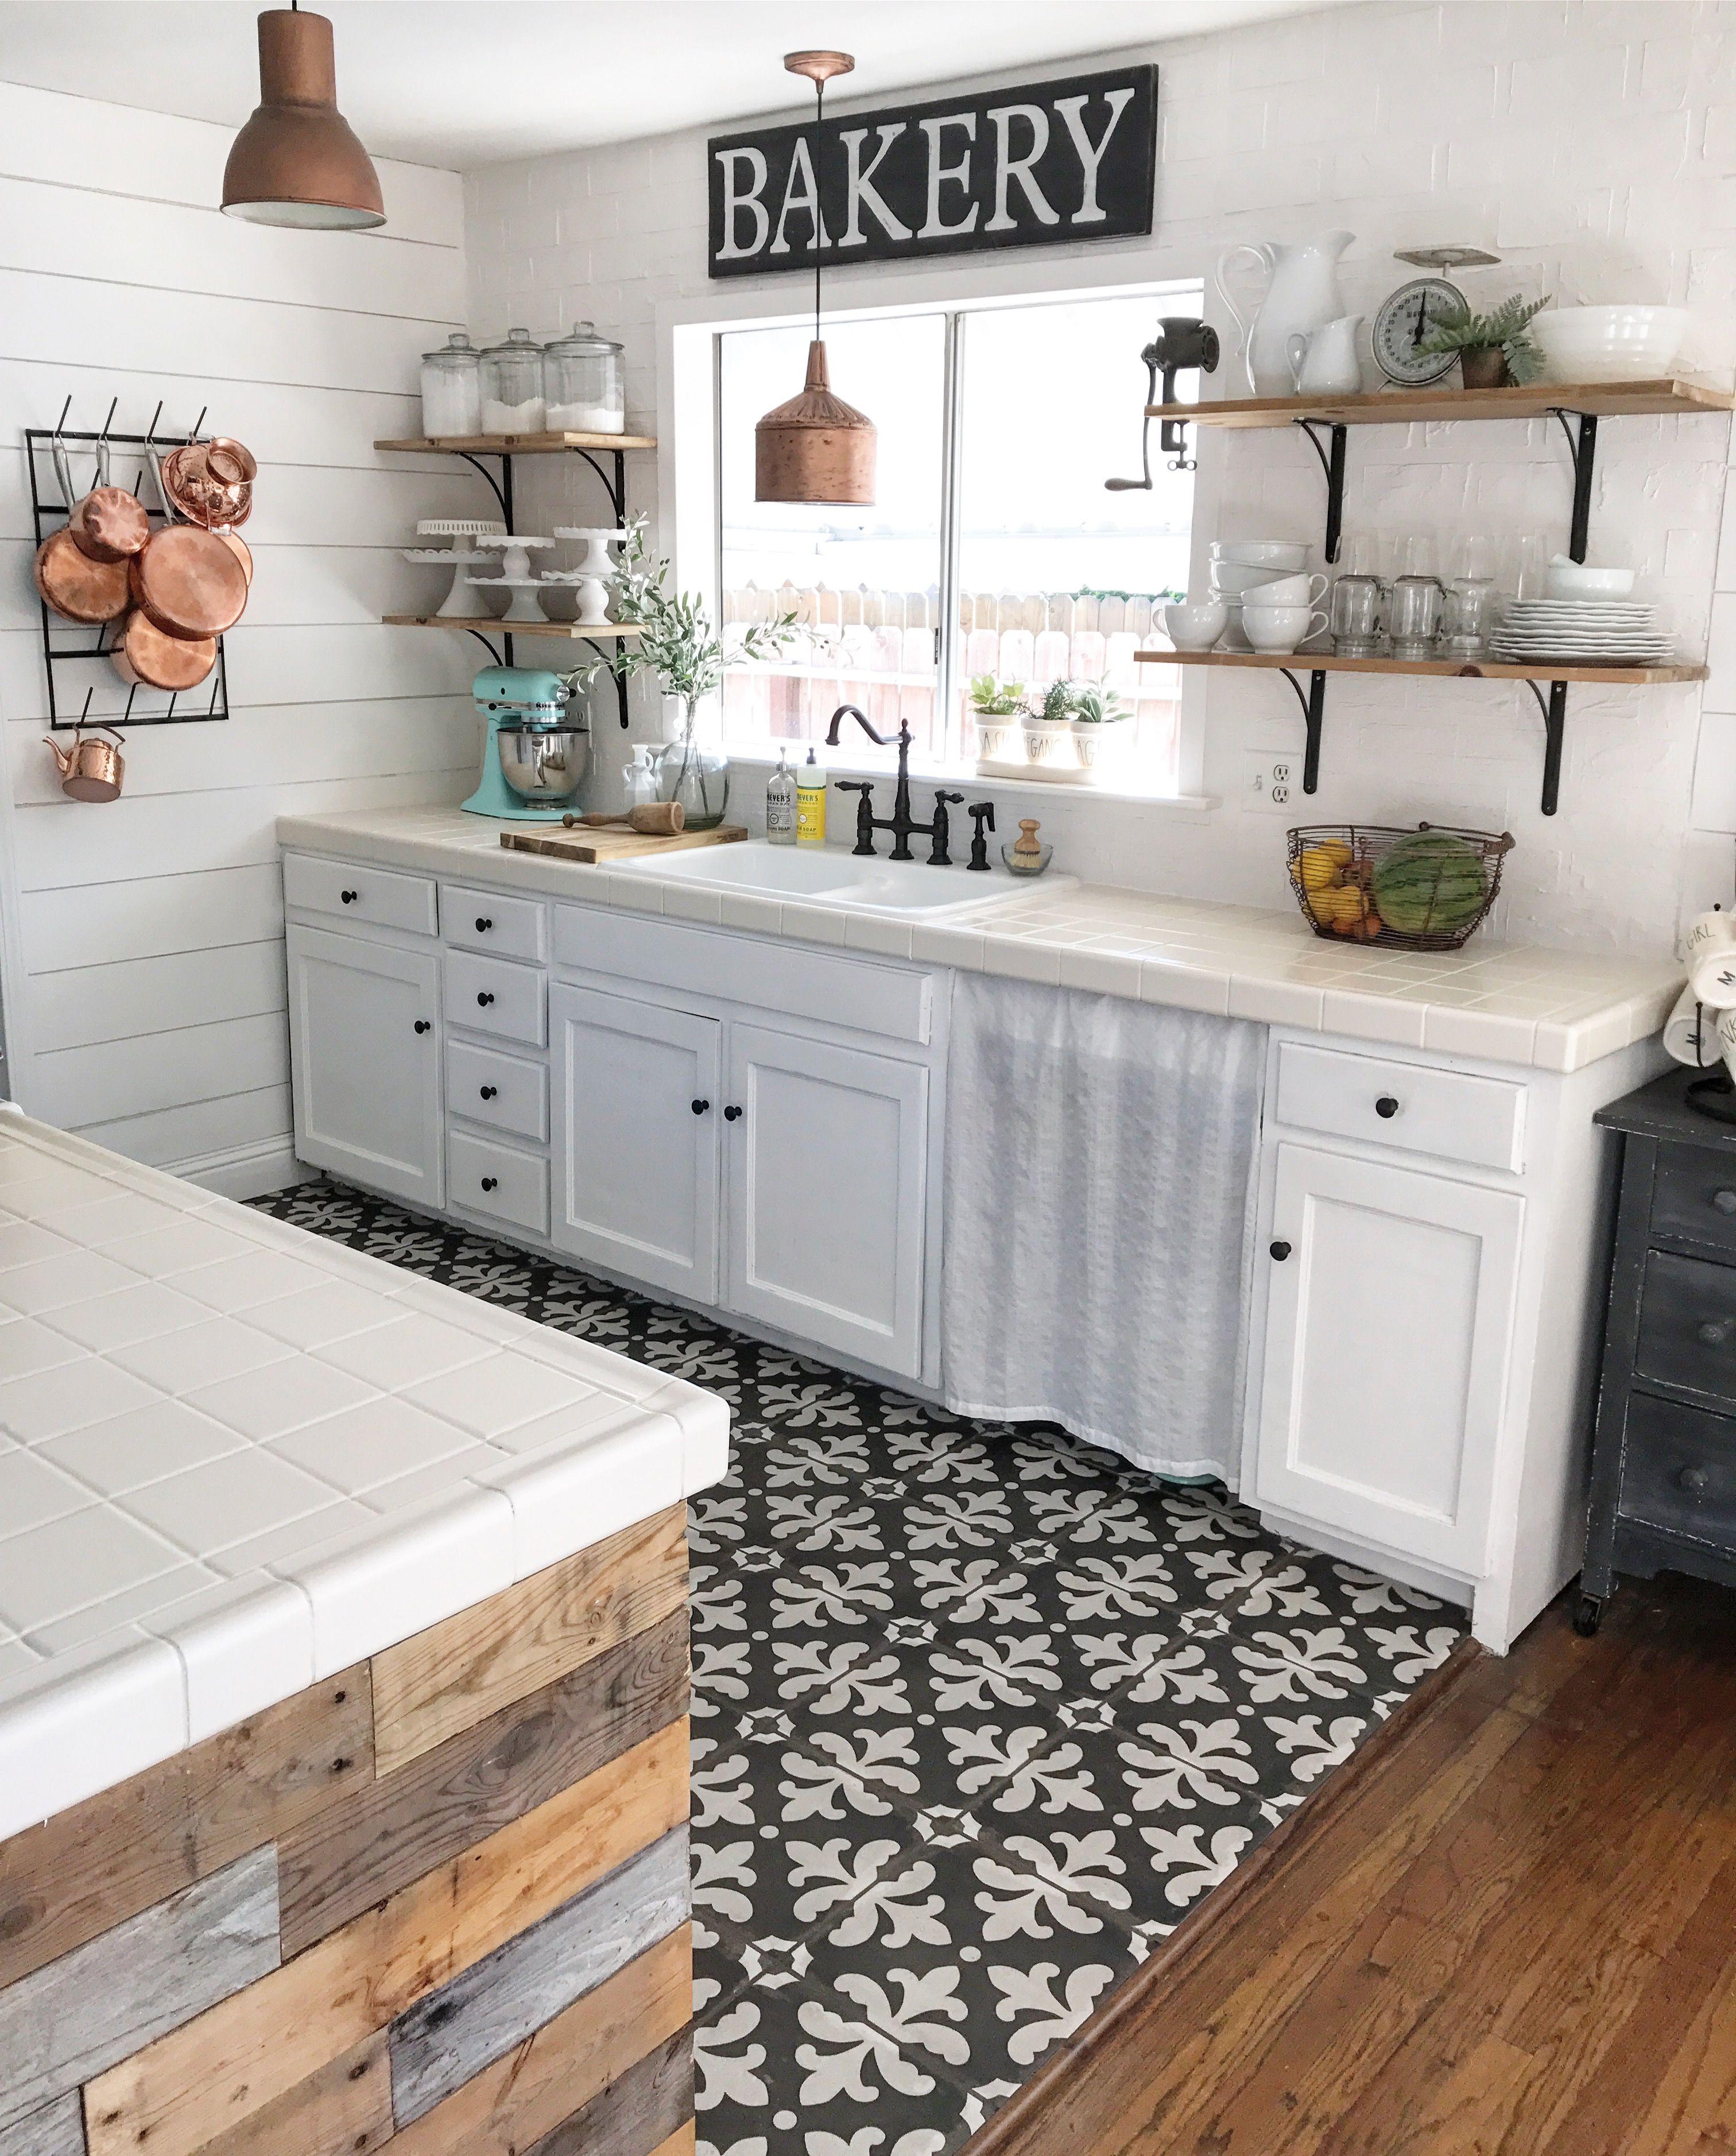 Black and white tile. Copper pans. Cottage kitchen ...